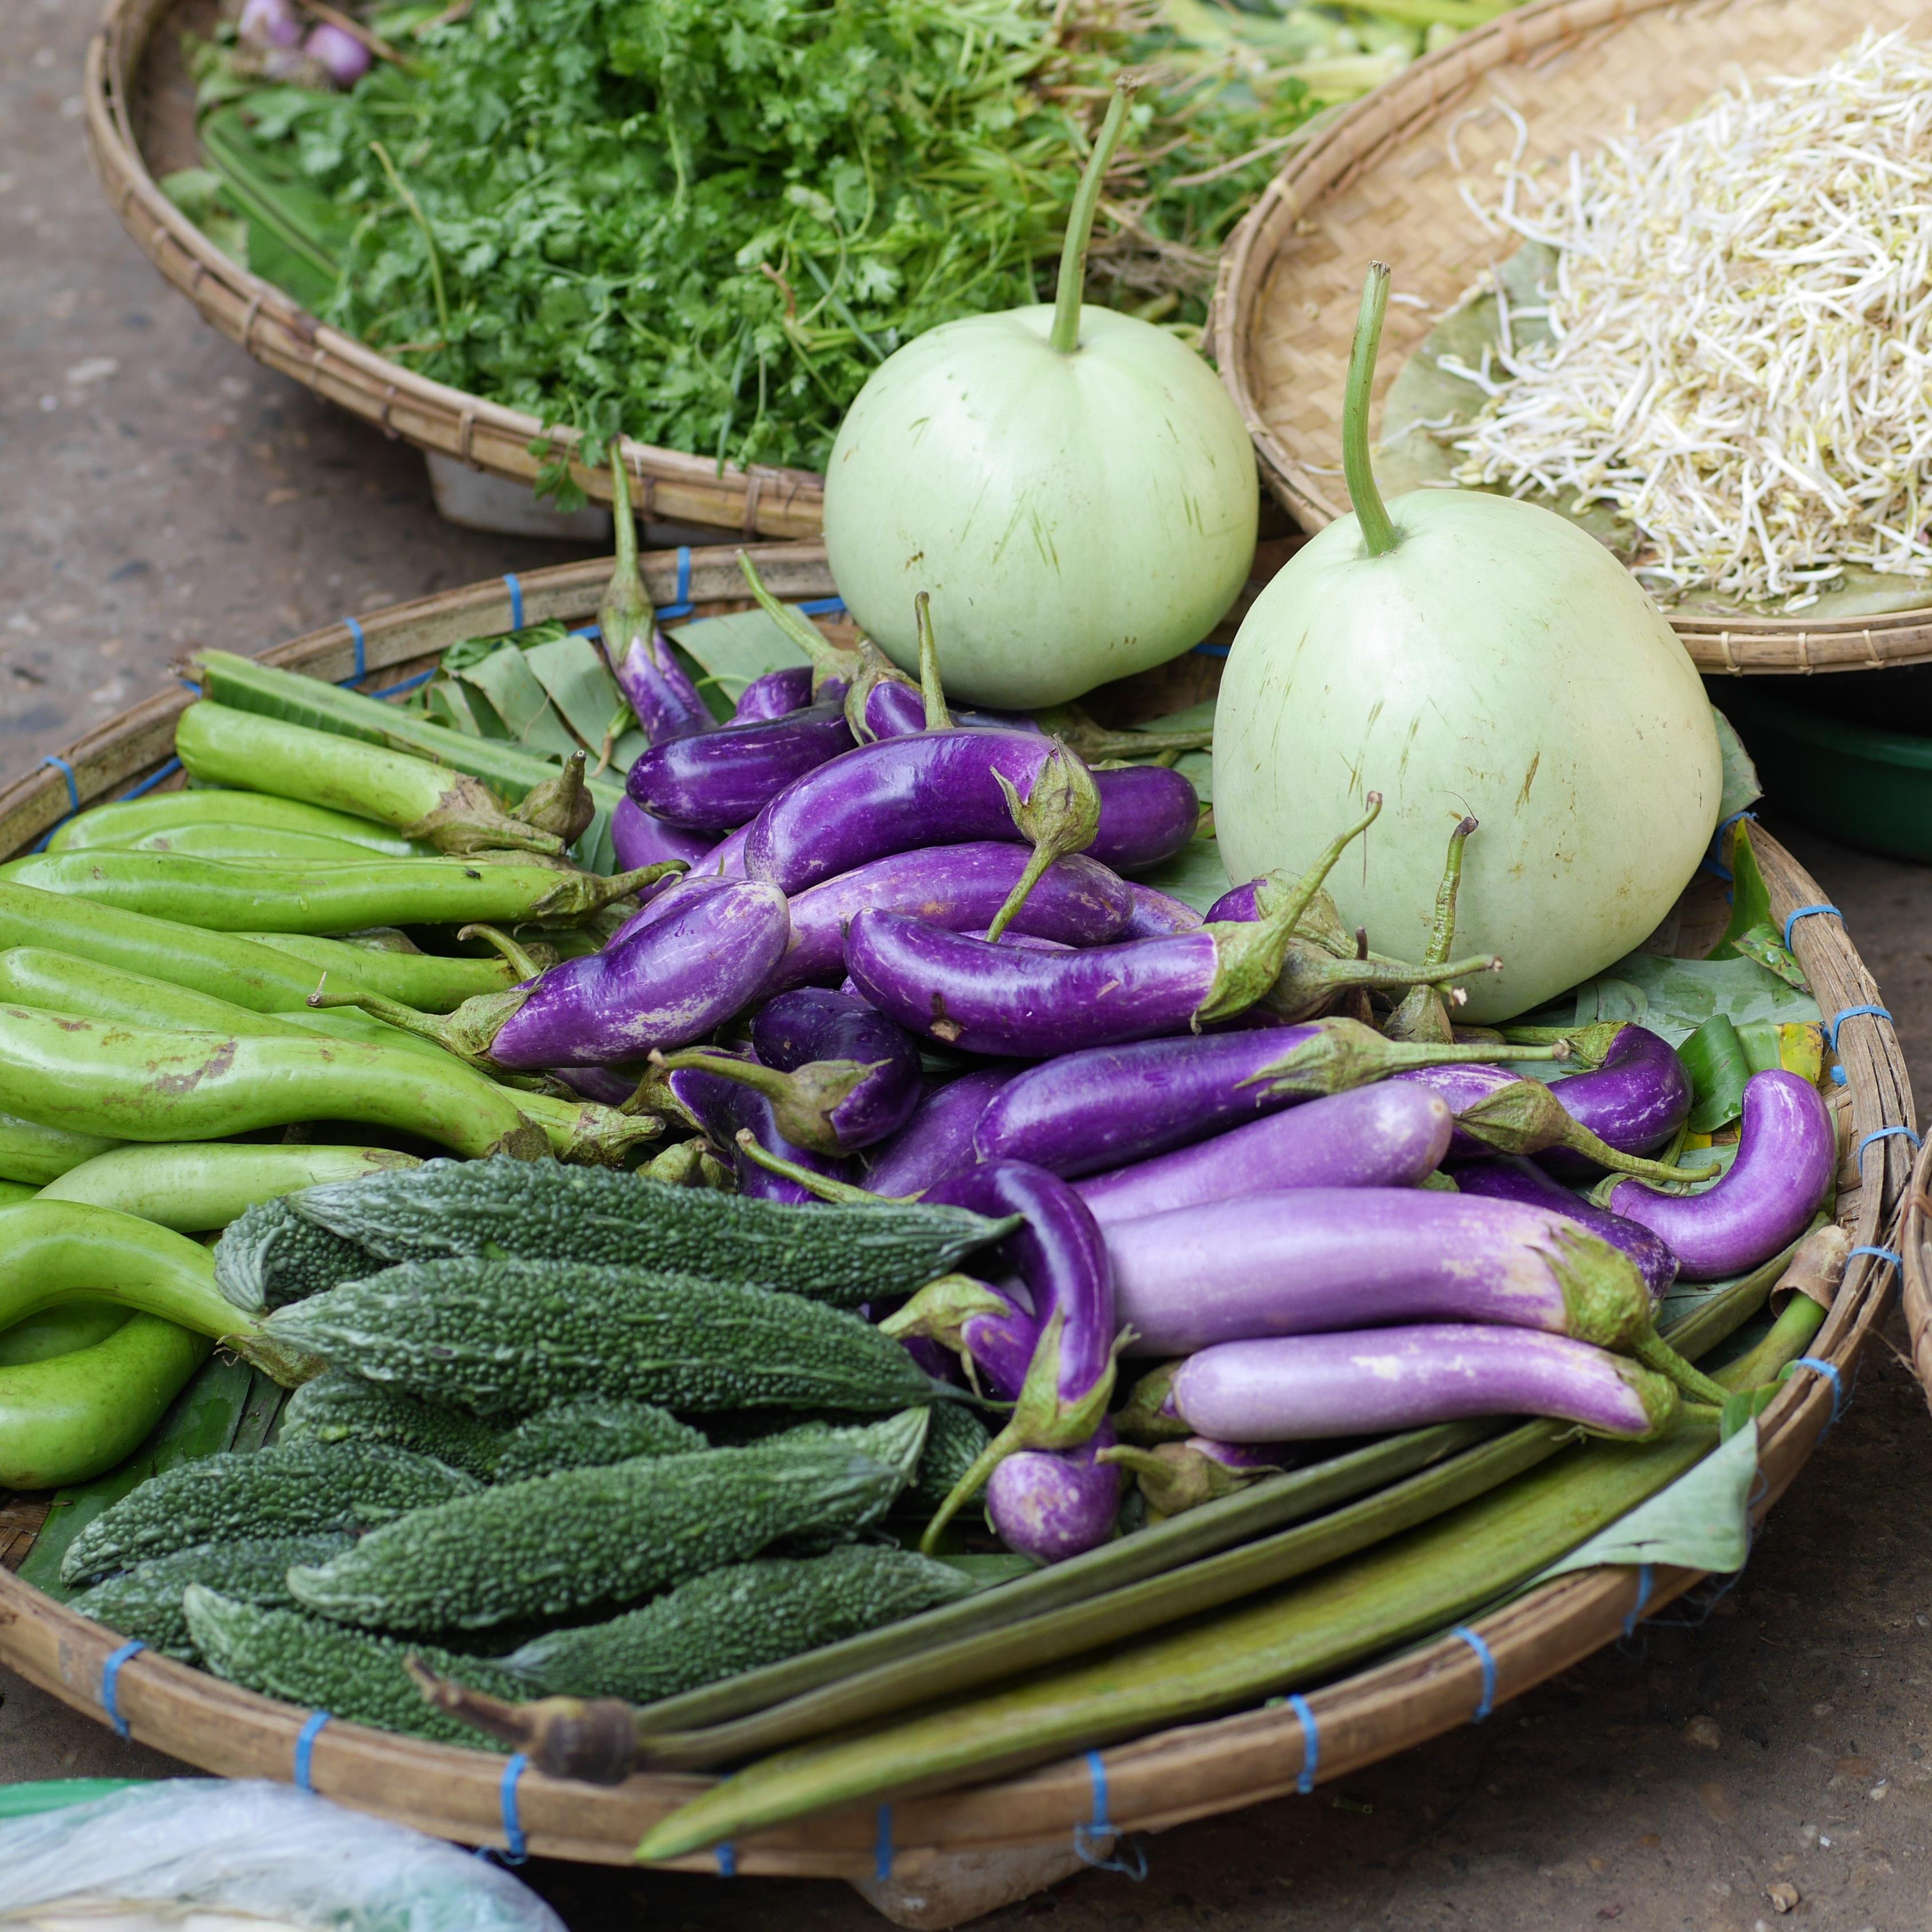 Free Images : food, harvest, produce, vegetable, pumpkin